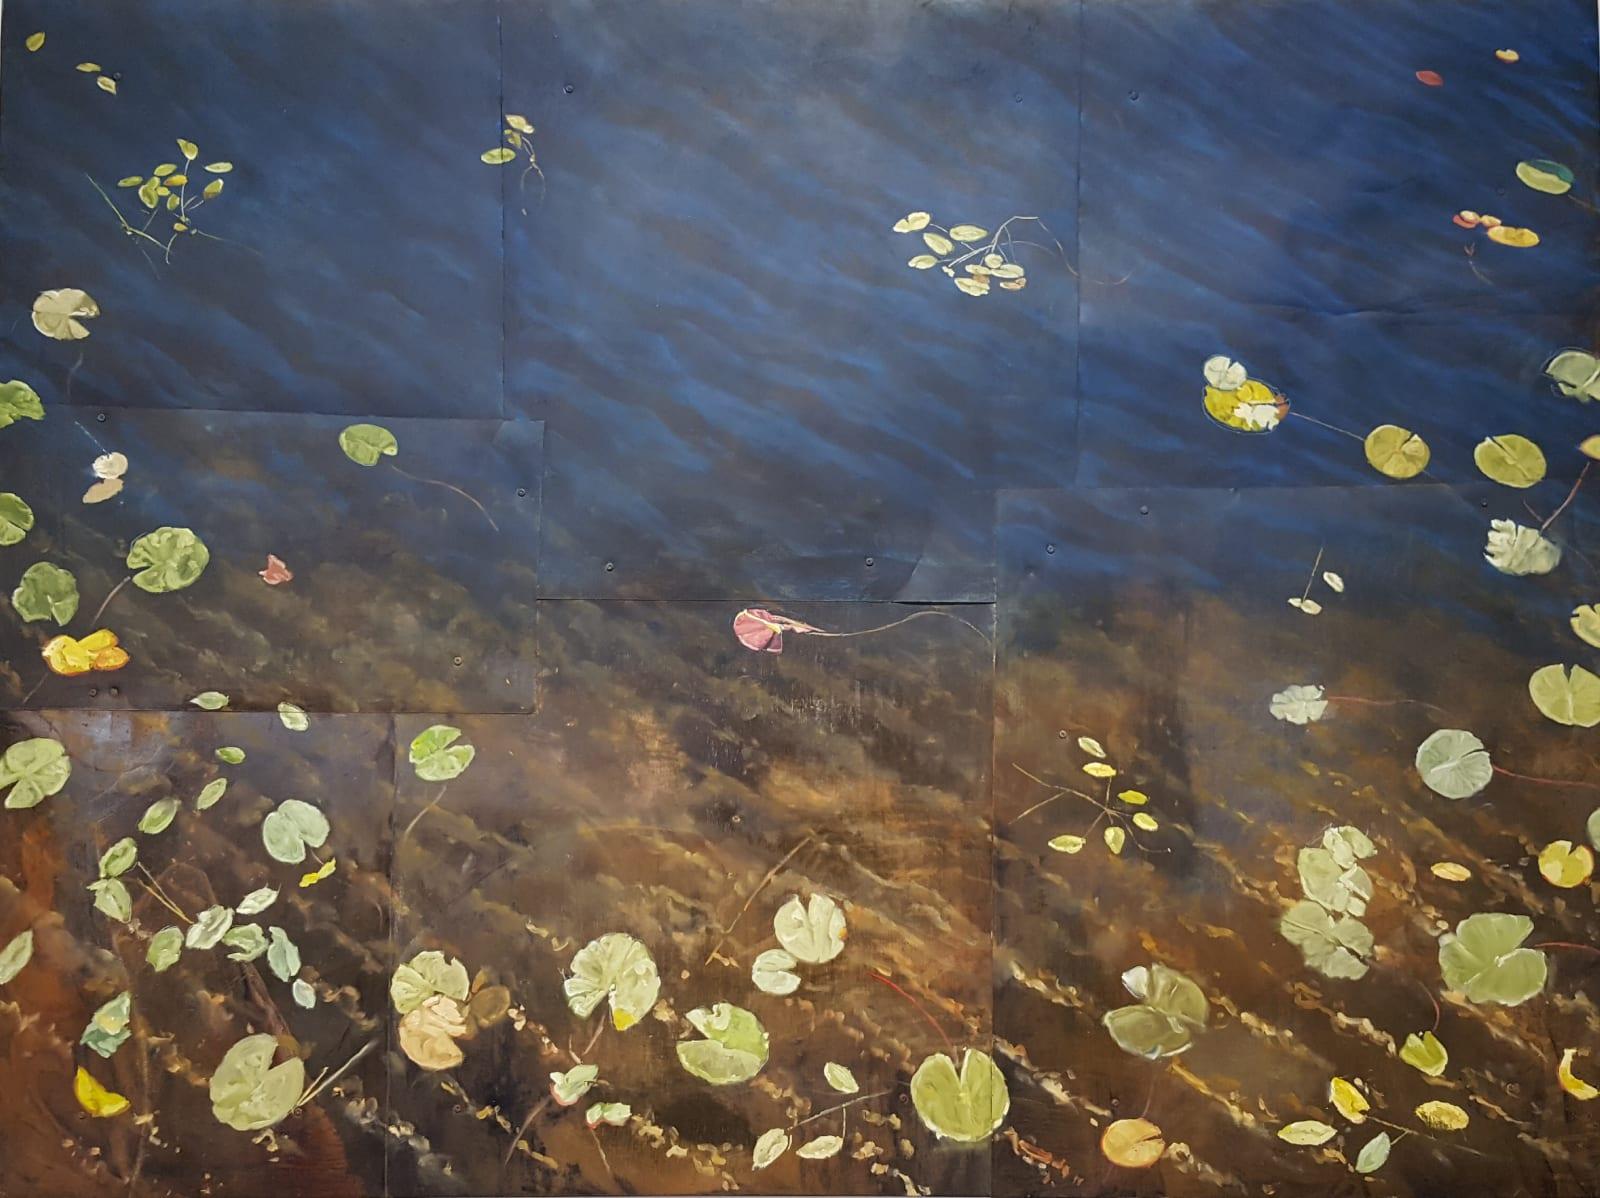 Drew Galloway, Across the Pond